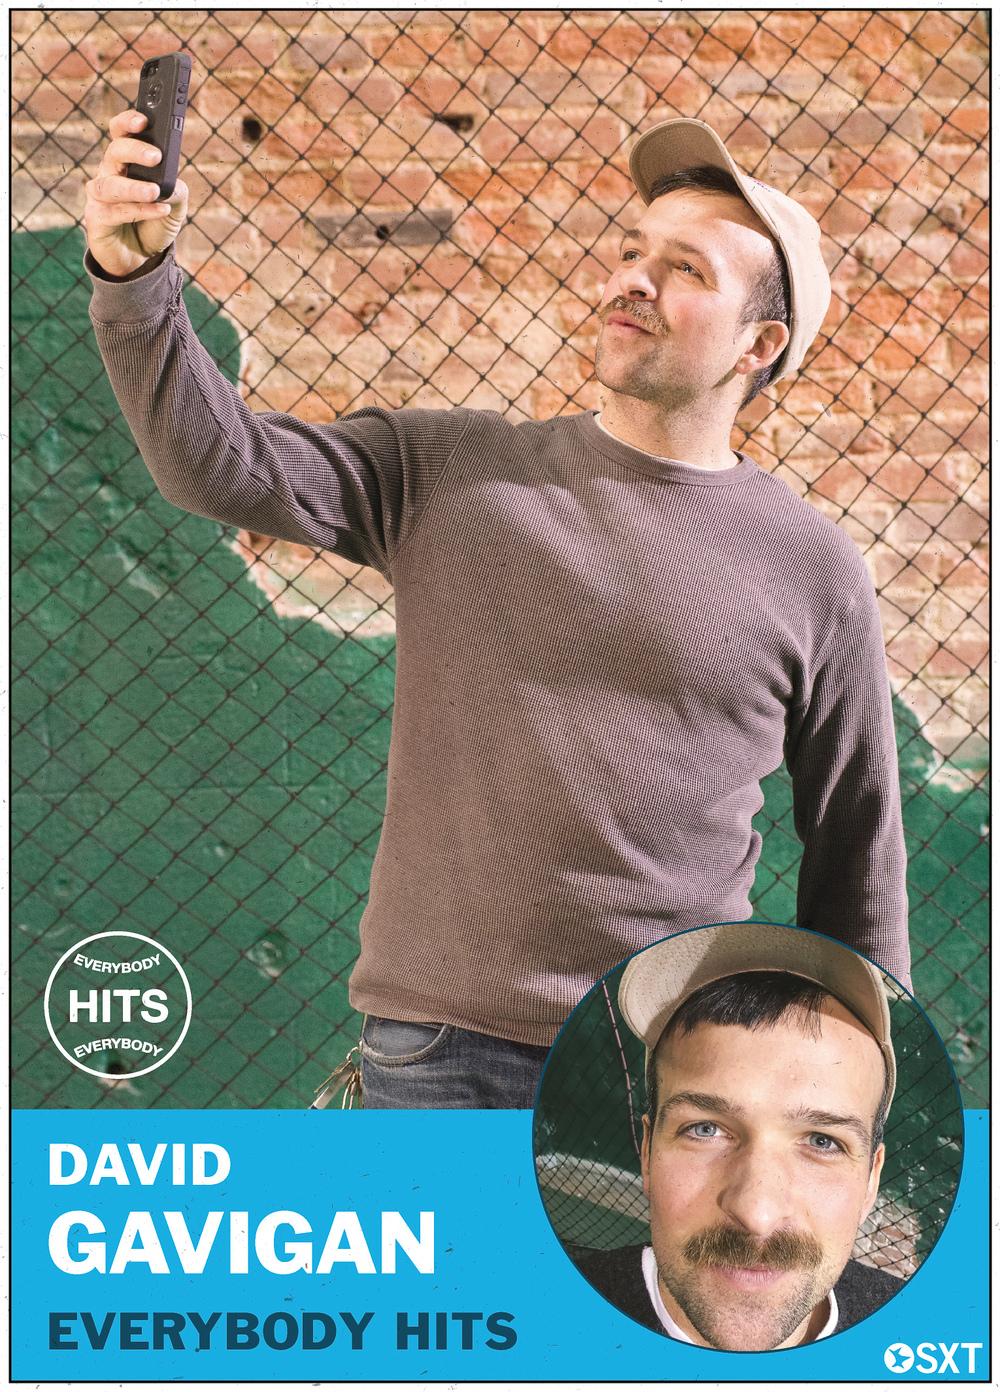 David Gavigan of Everybody Hits